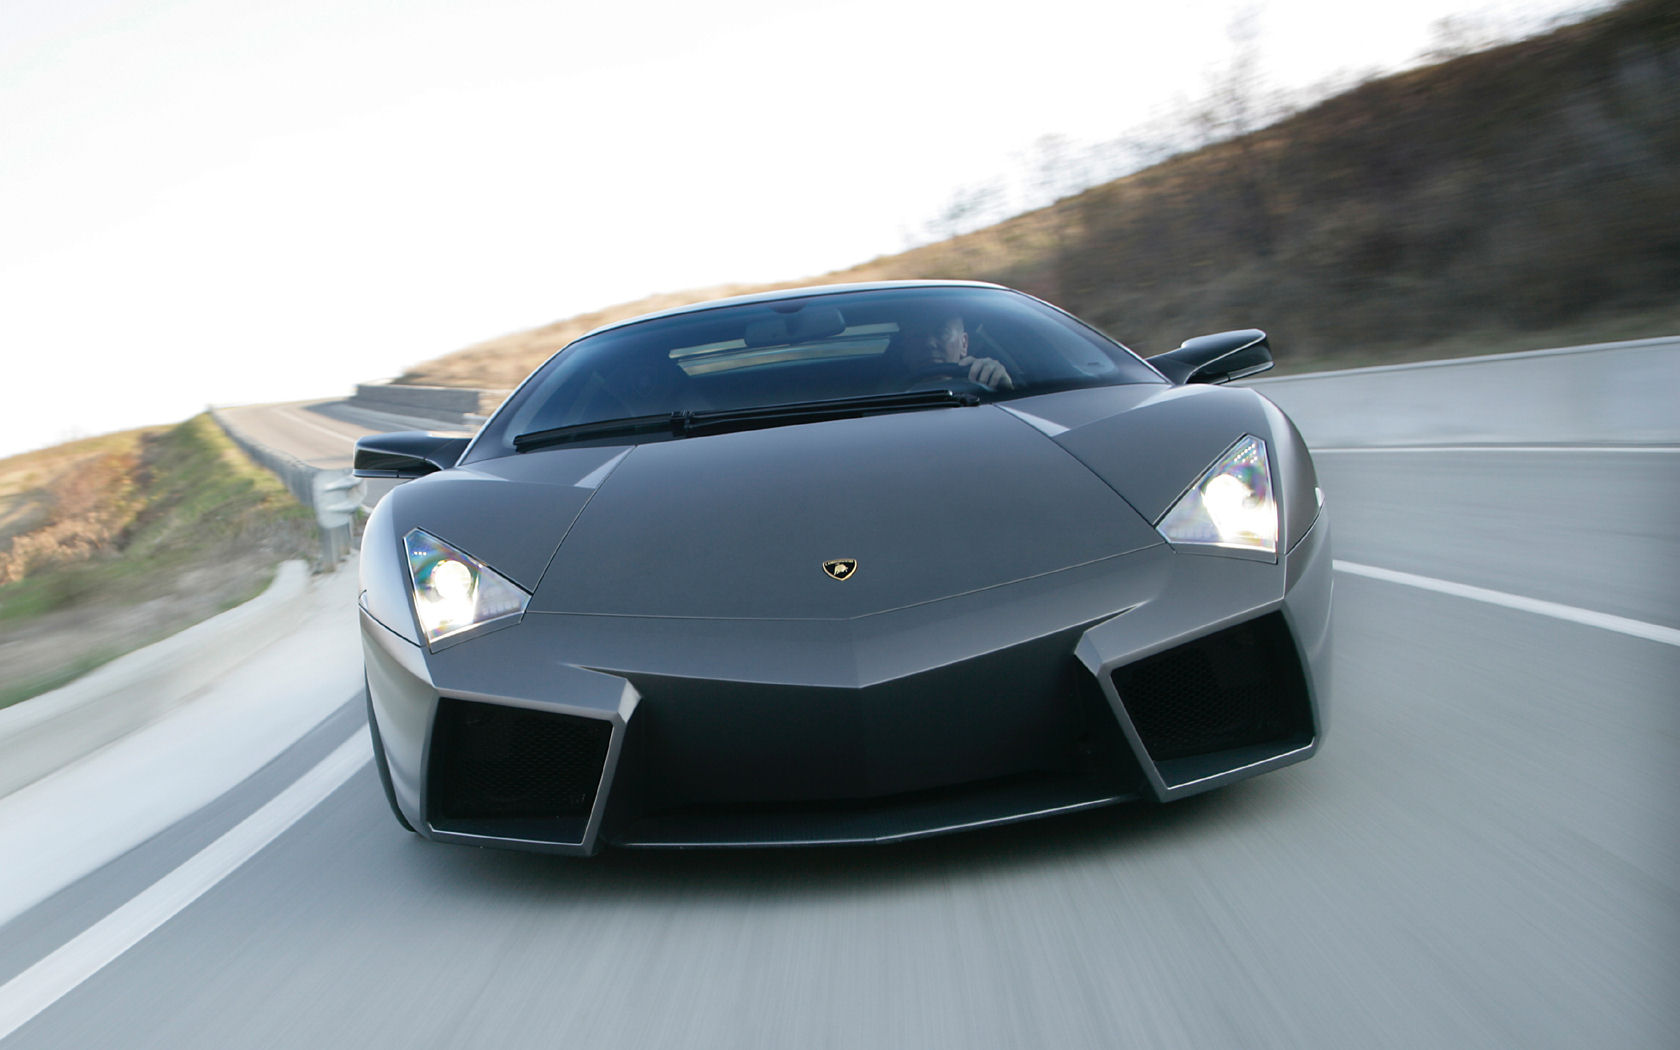 Lamborghini Reventon Wallpaper Widescreen Wallpapersafari